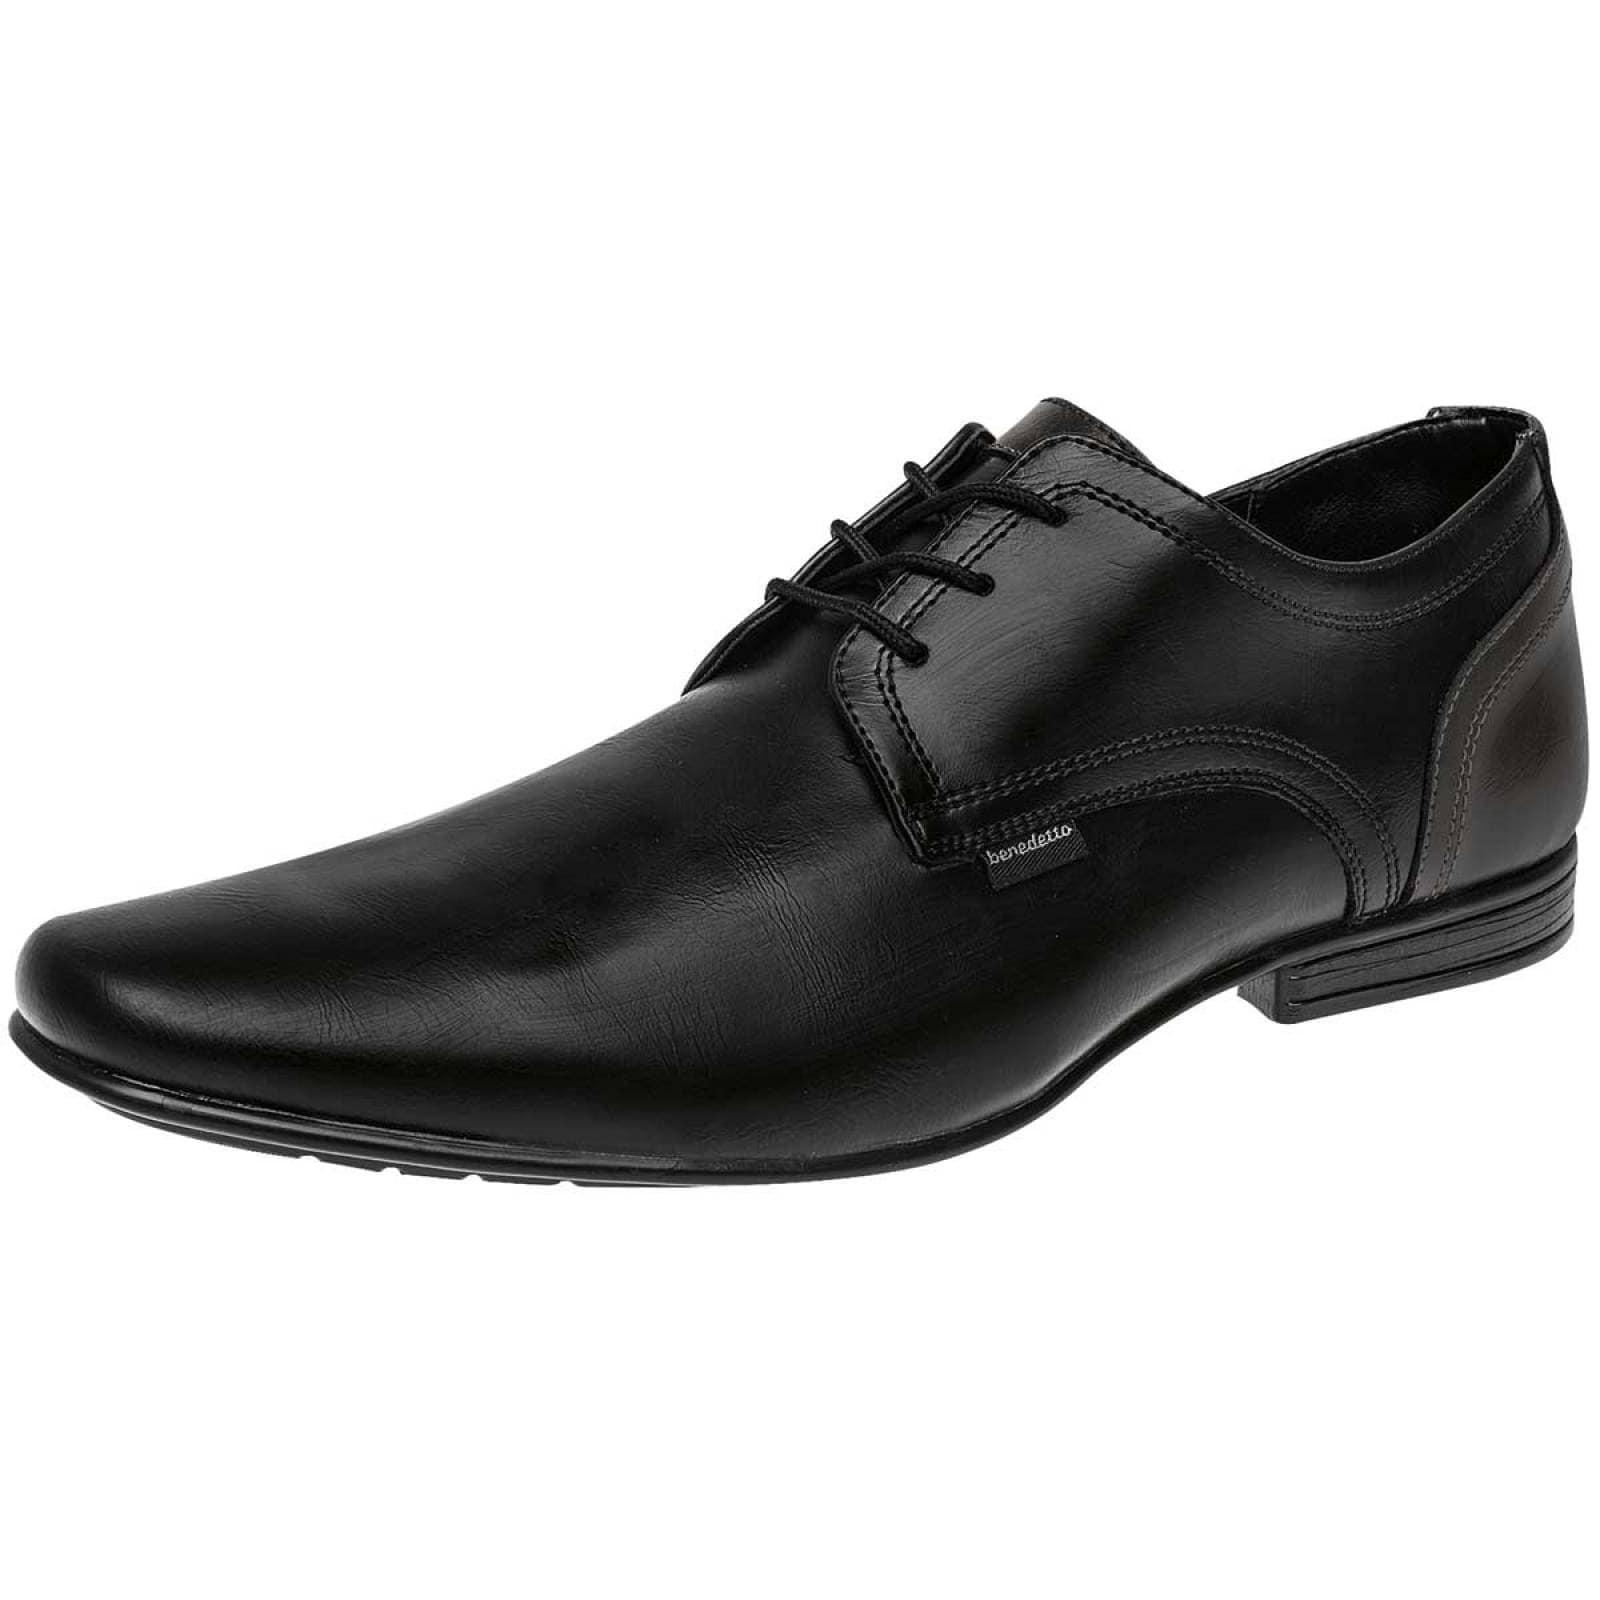 Benedetto shoes Zapato Hombre Negro gris